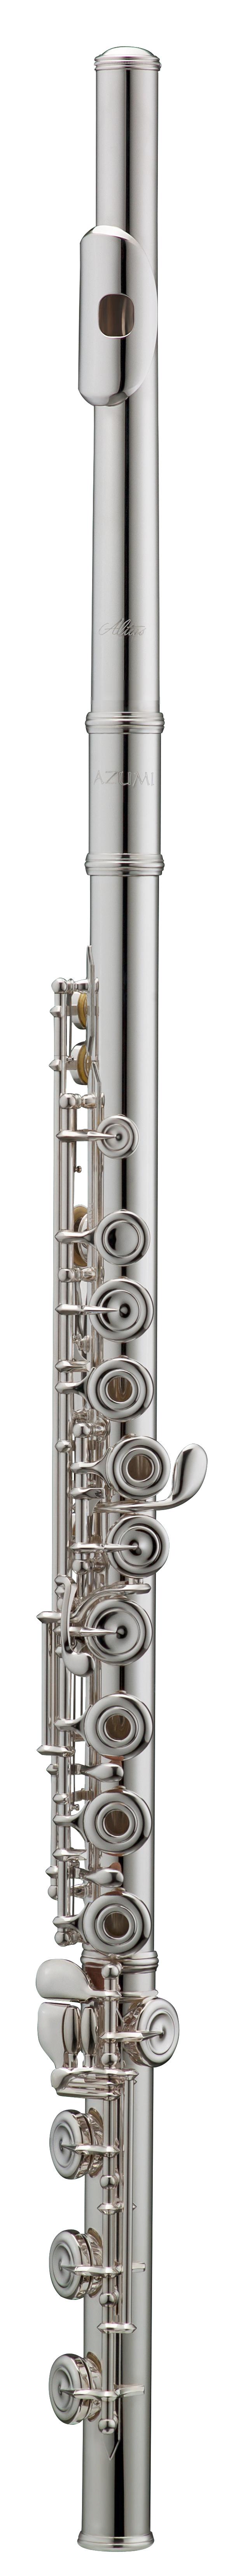 Azumi - AZ-Z3 - RBEO - Holzblasinstrumente - Flöten mit E-Mechanik | MUSIK BERTRAM Deutschland Freiburg